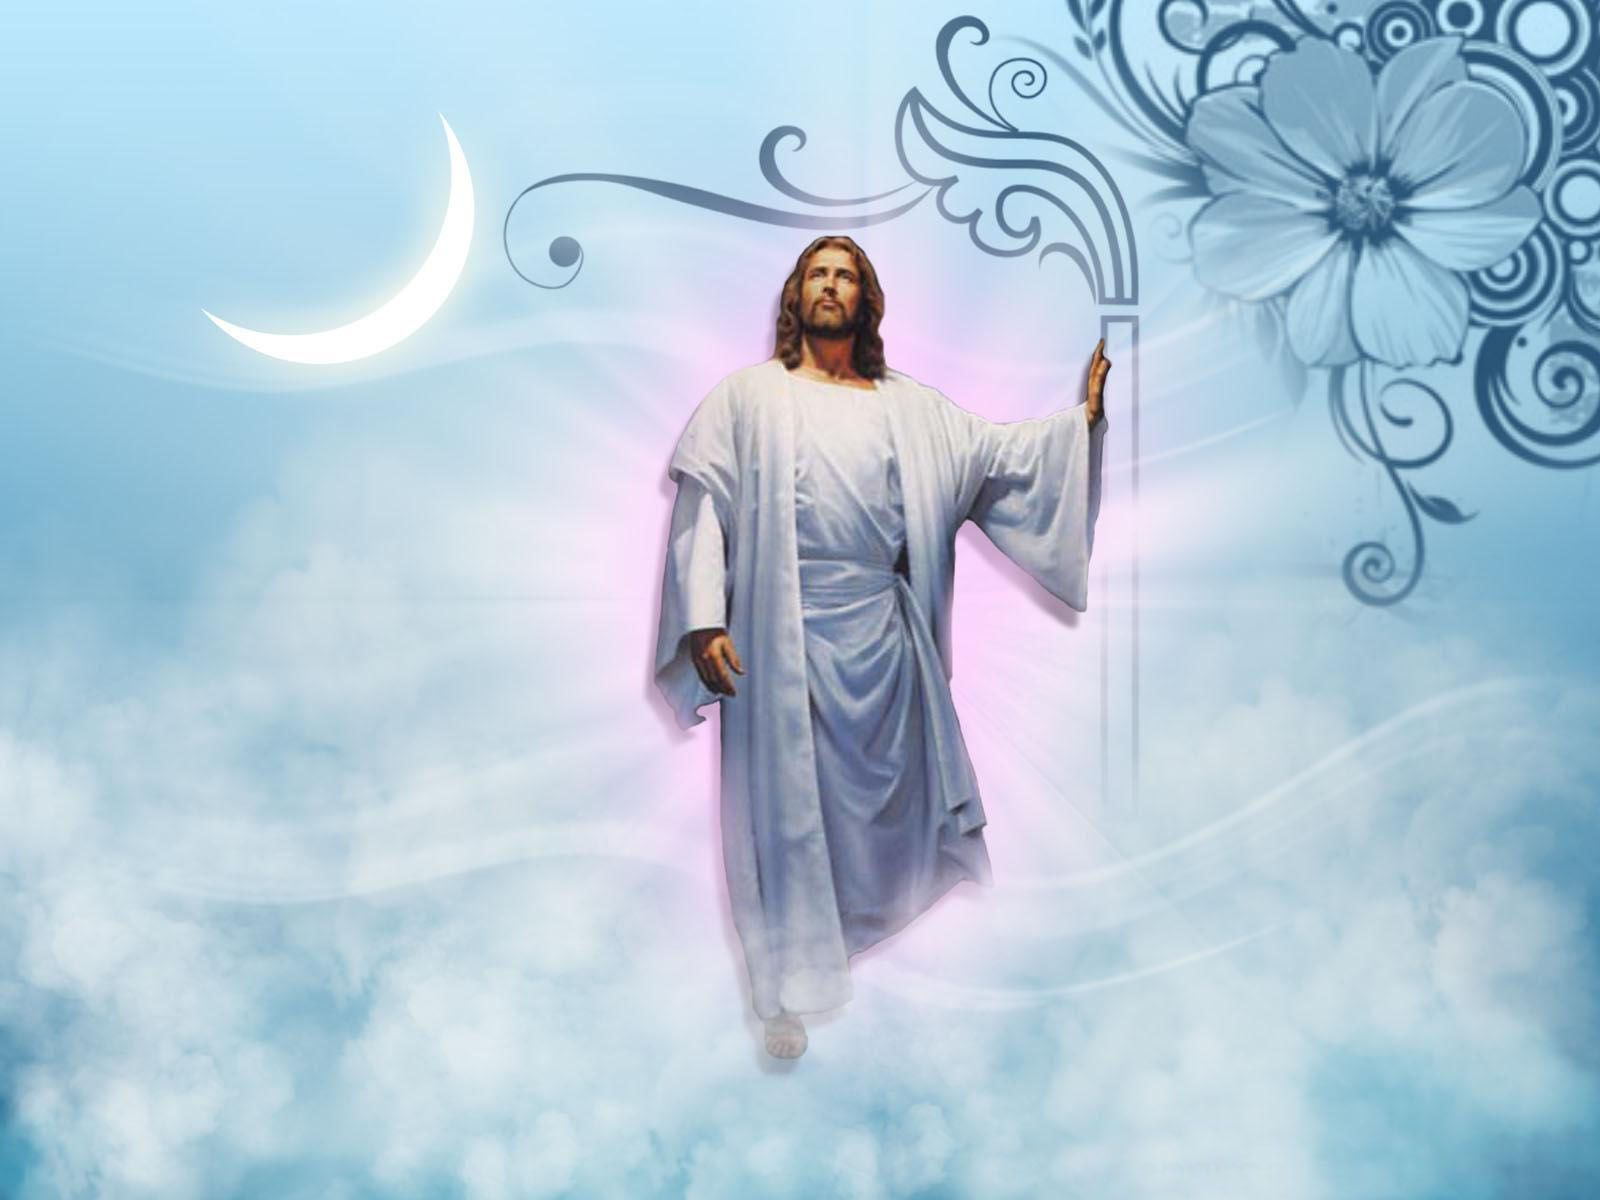 jesus christ widescreen wallpapers - photo #40